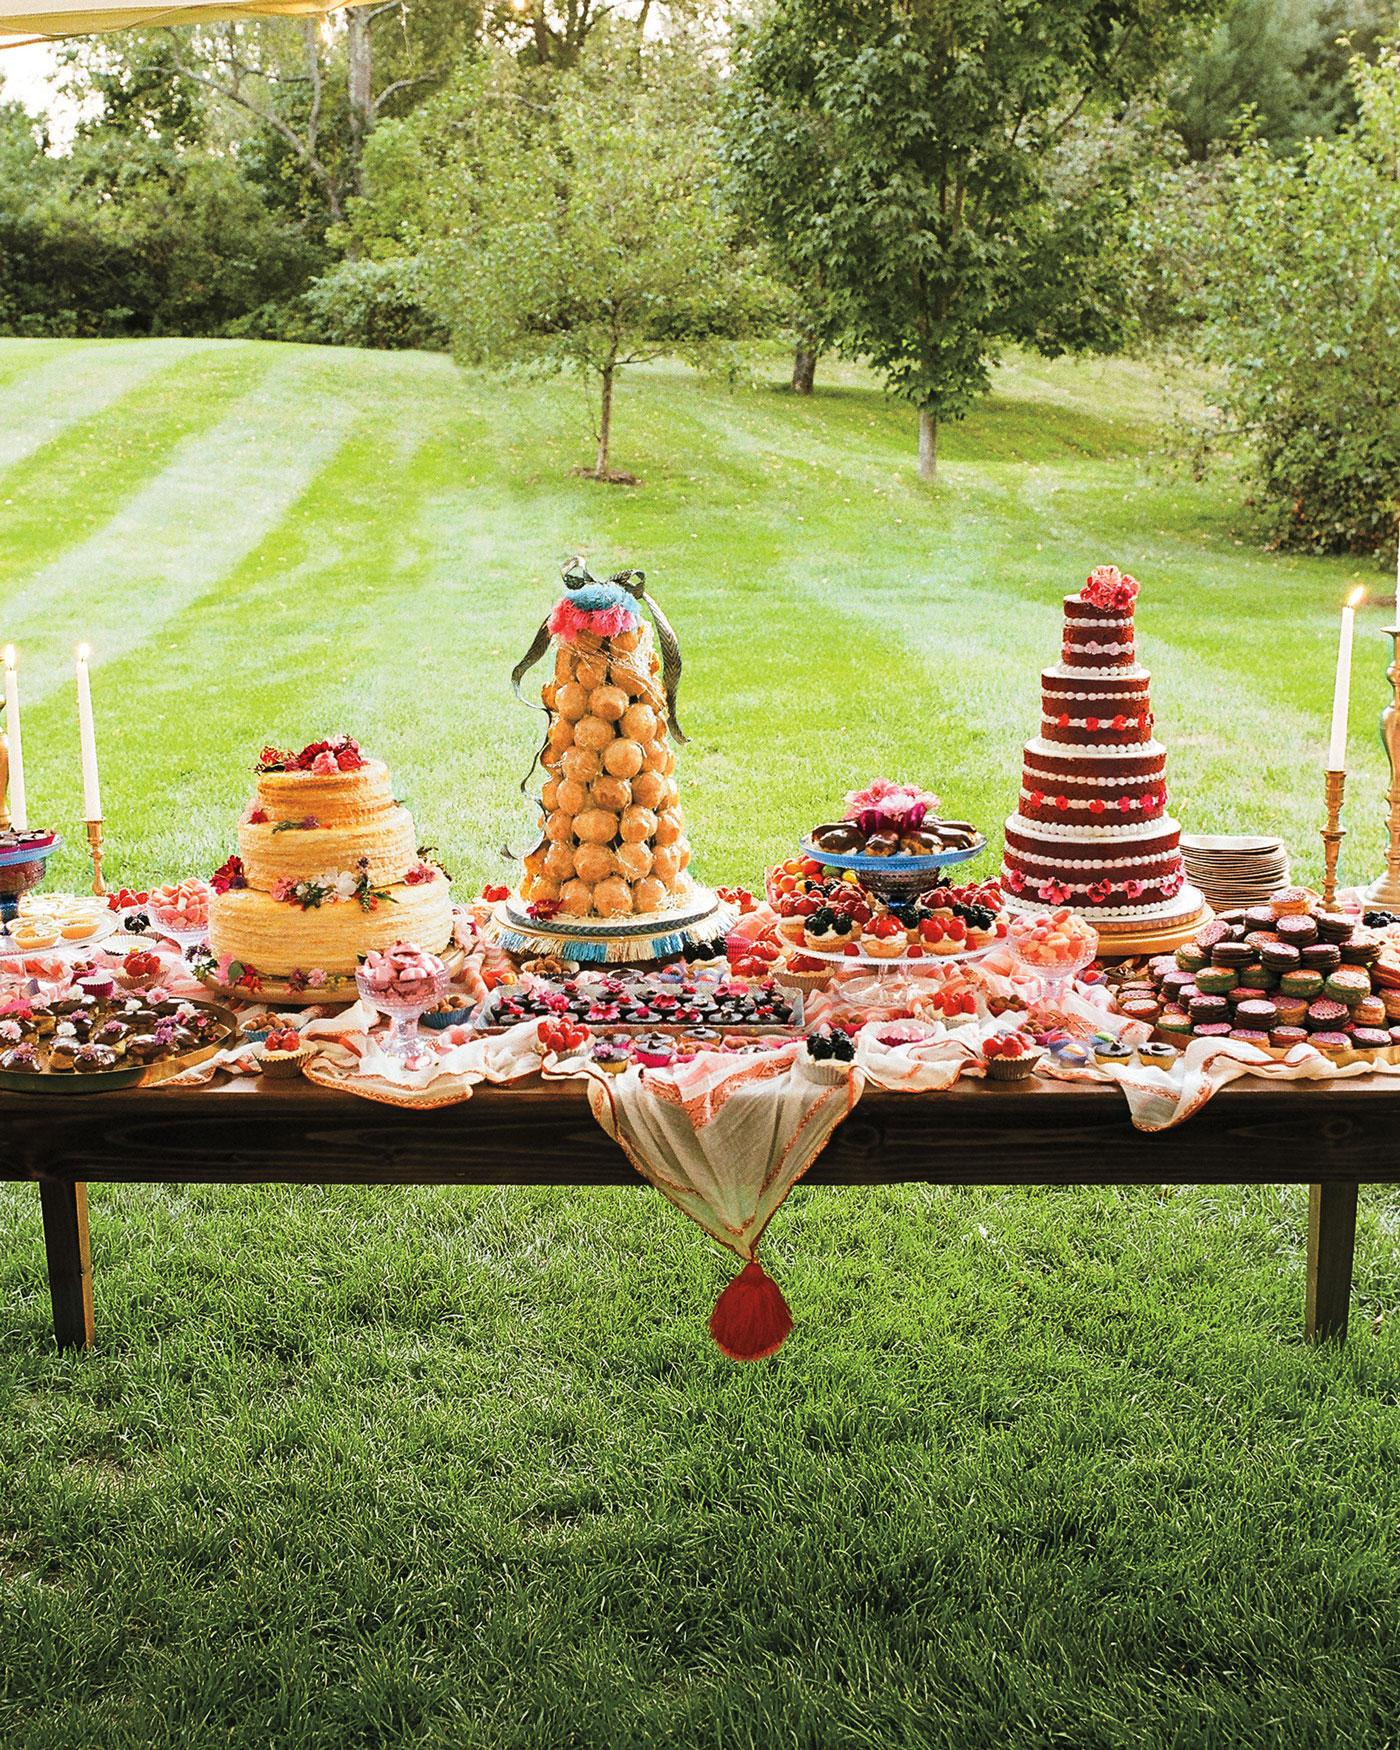 mfiona-peter-wedding-vermont-dessert-table-9679.16r.2015.47-d112512.jpg